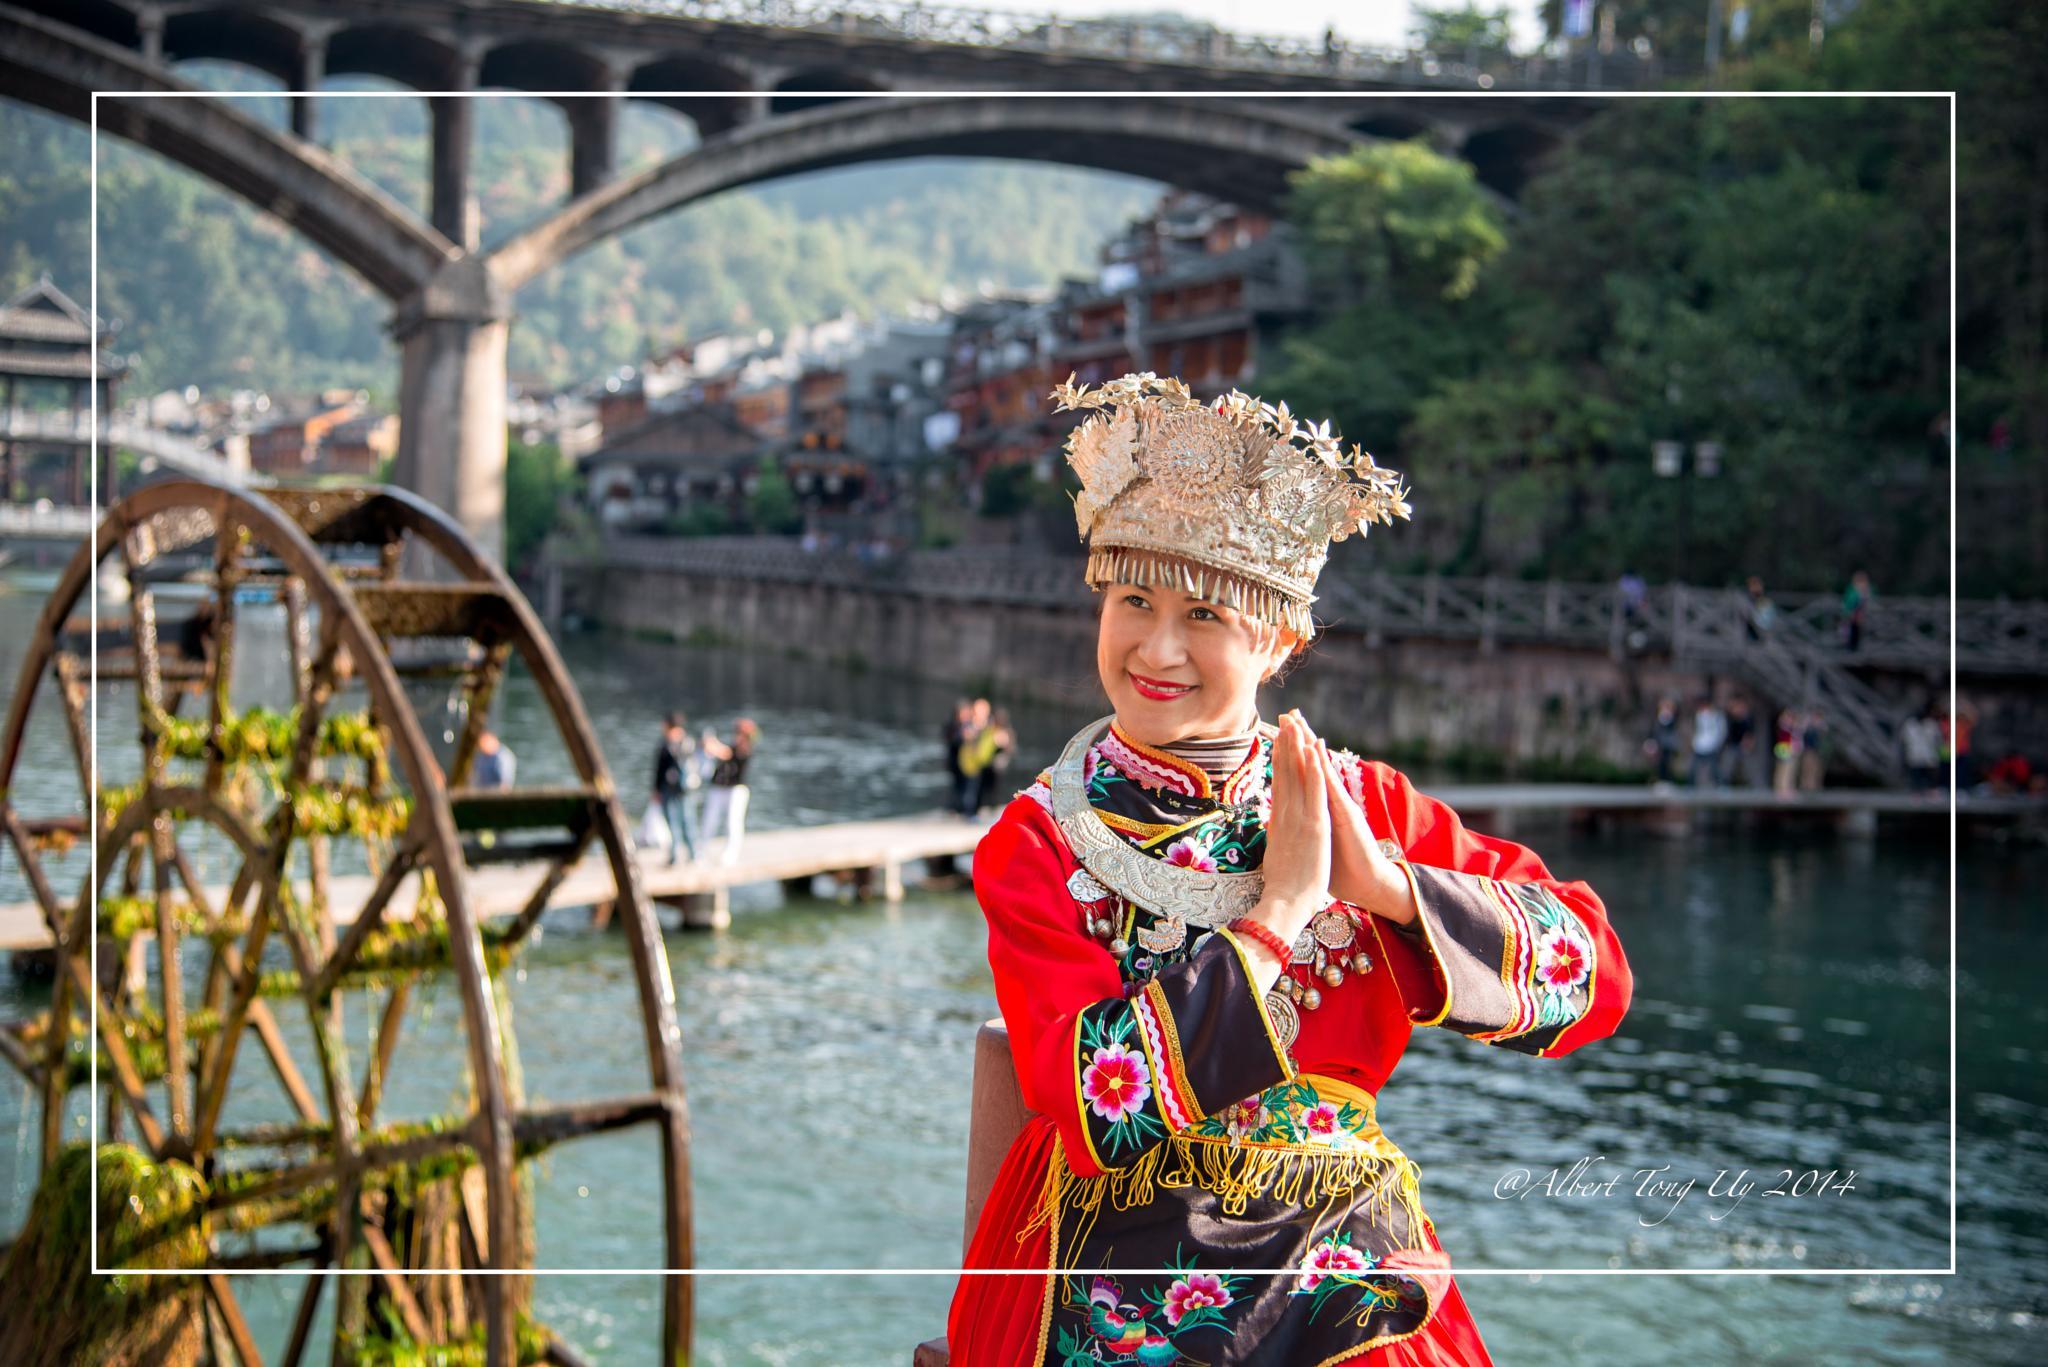 My Wife My Model in Phoenix Old Town, Hunan, China photo 11 by iatu8888